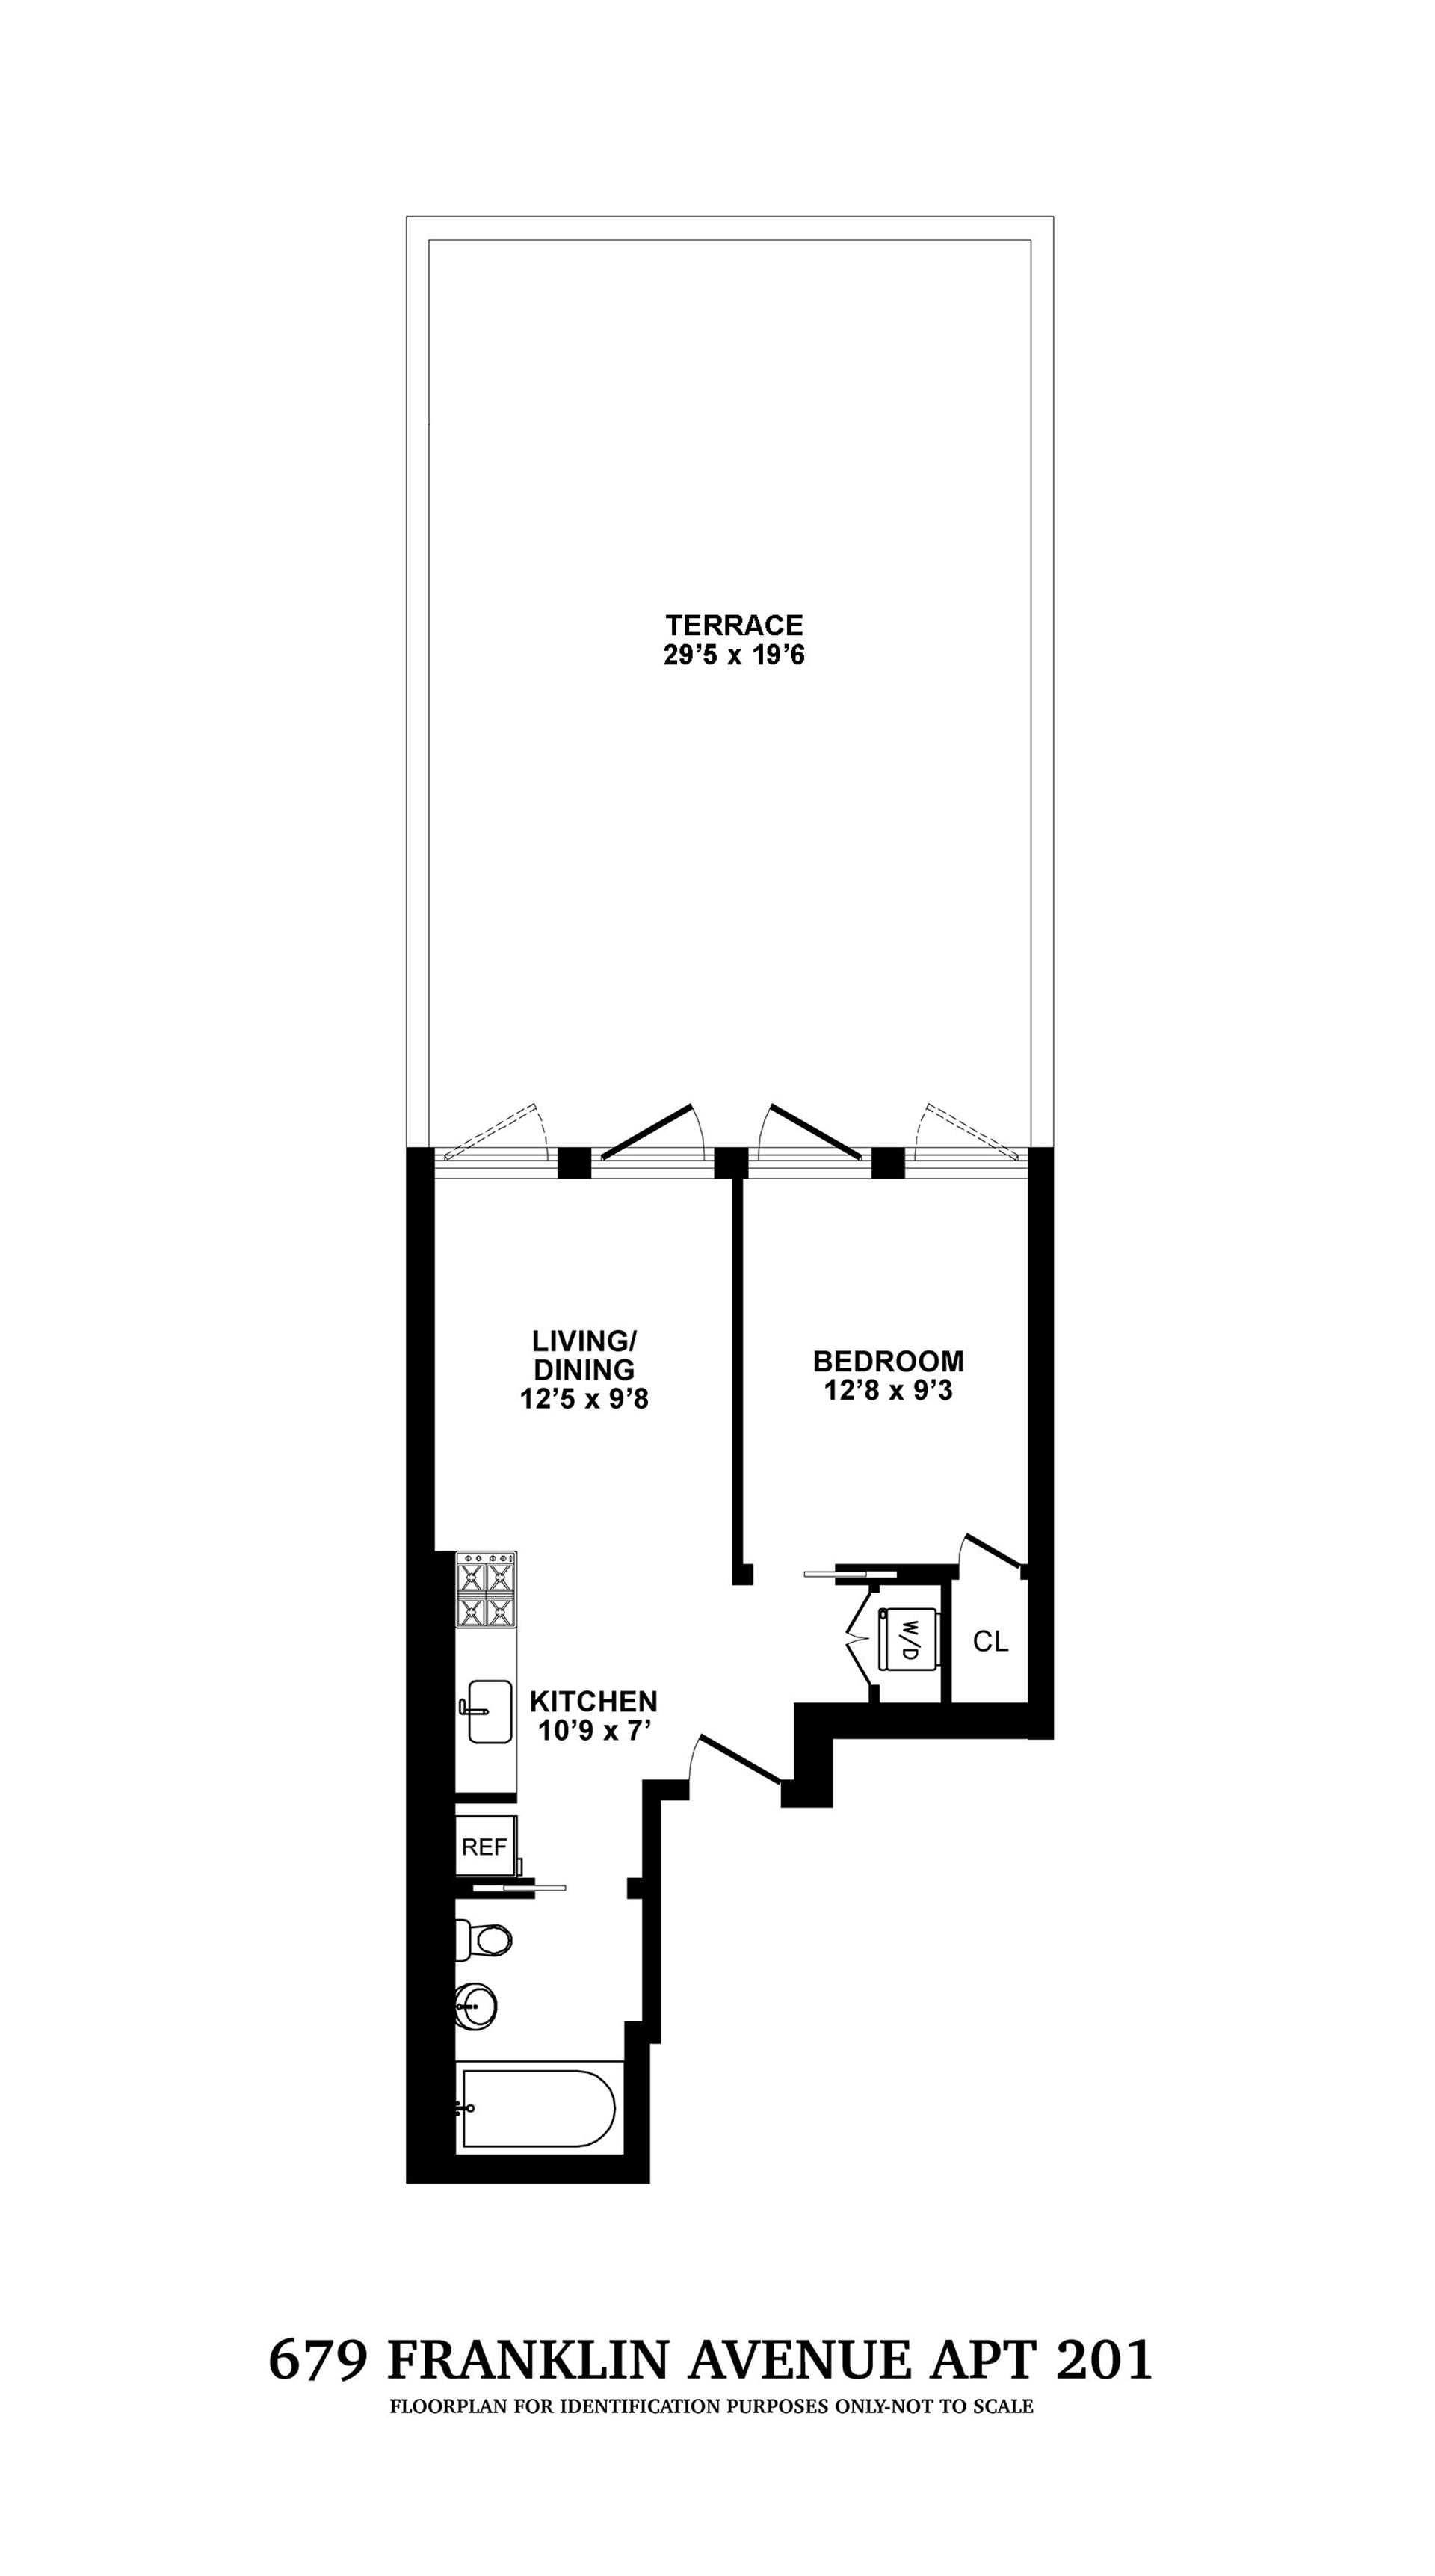 Floor plan of 679 Franklin Avenue, 201 - Crown Heights, New York